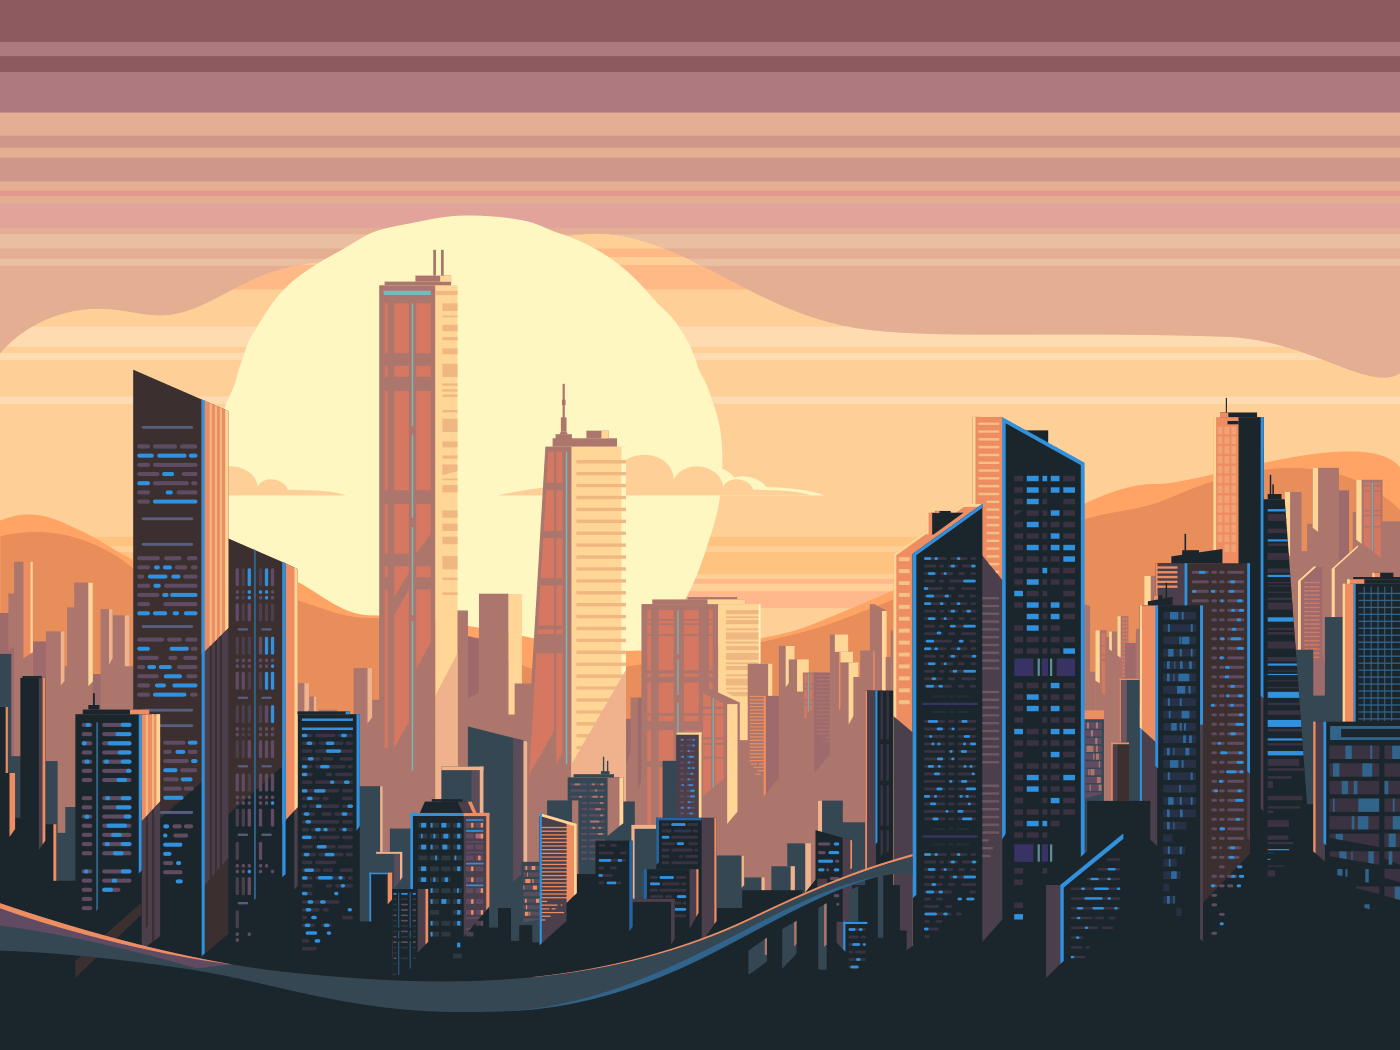 Sunrise landscape in city